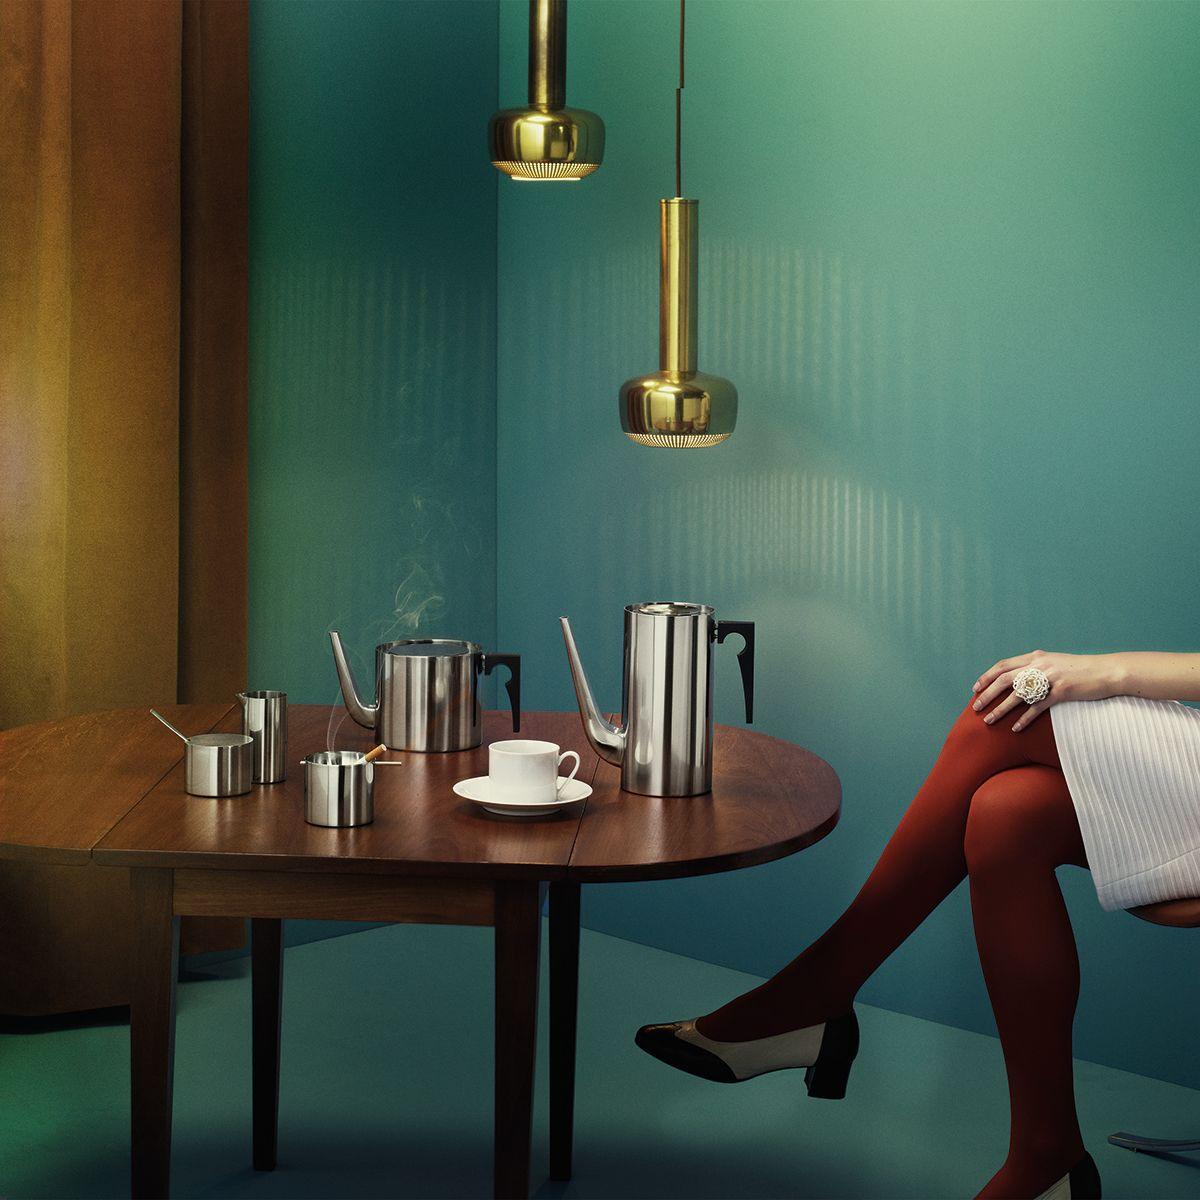 Arne jacobsen interior stelton serie aj artvoll designer arnejacobsen tvoll